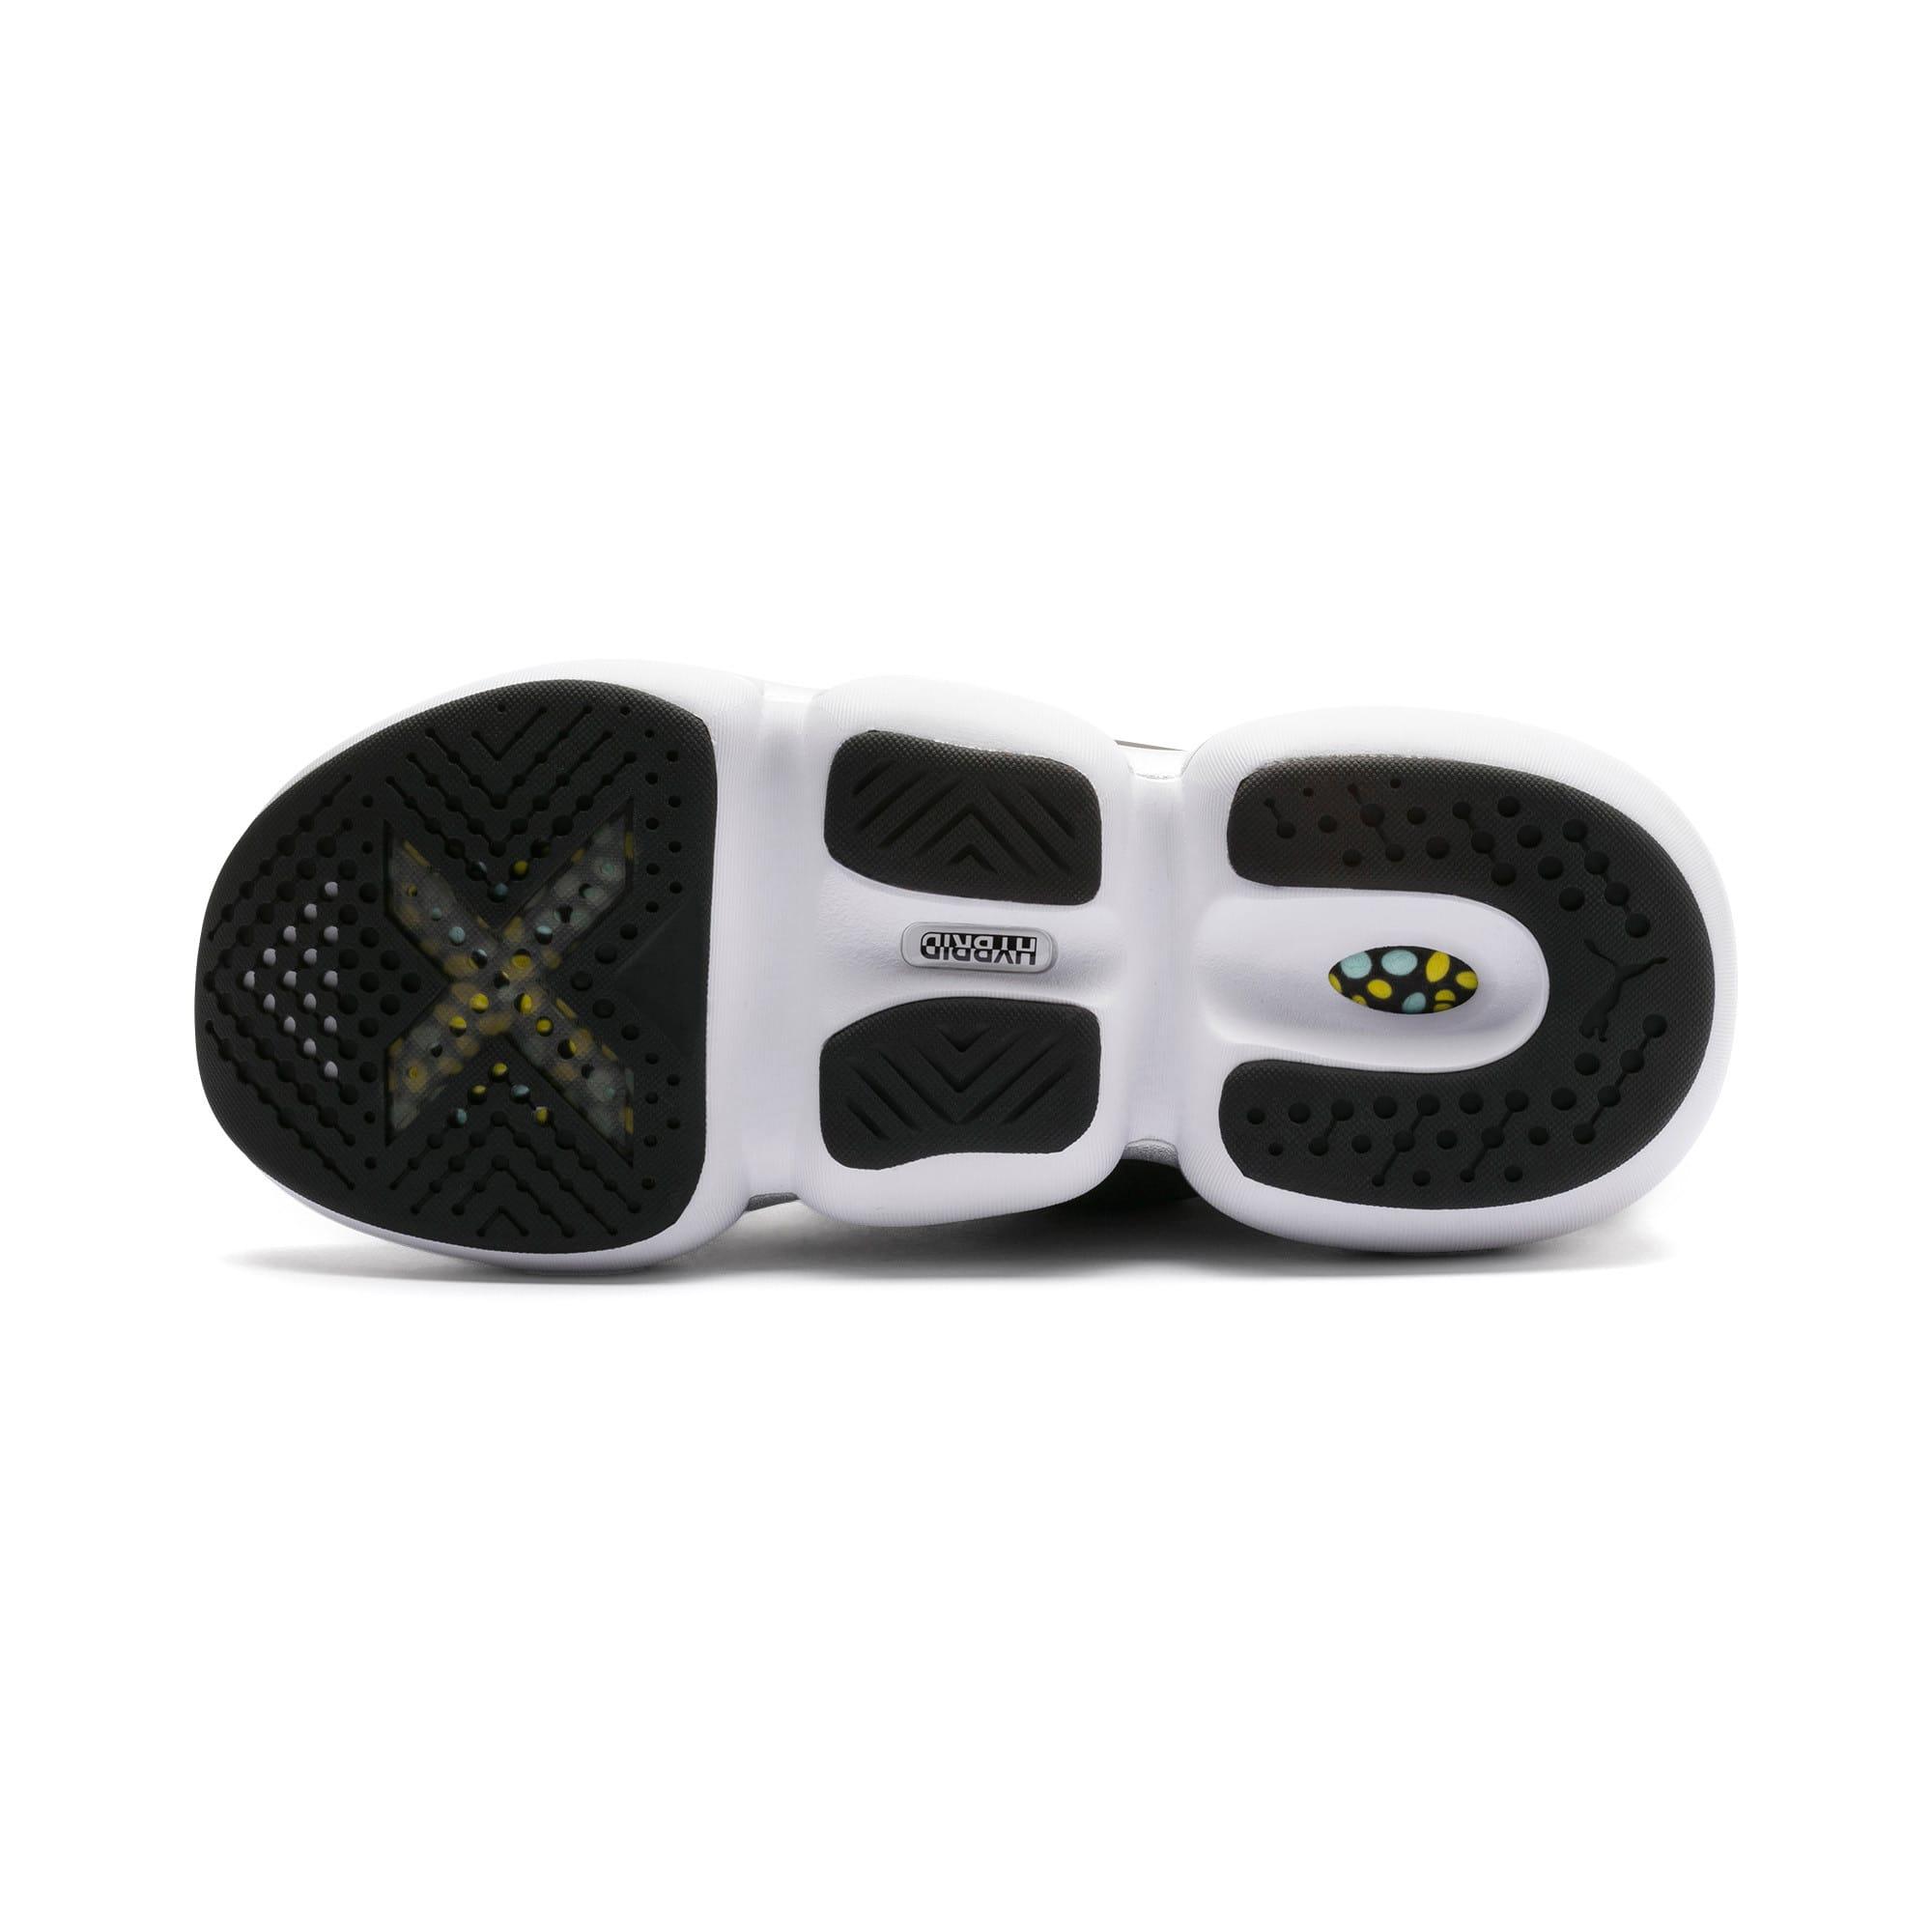 Imagen en miniatura 5 de Zapatillas de training de mujer Mode XT, Puma Black-Puma White, mediana